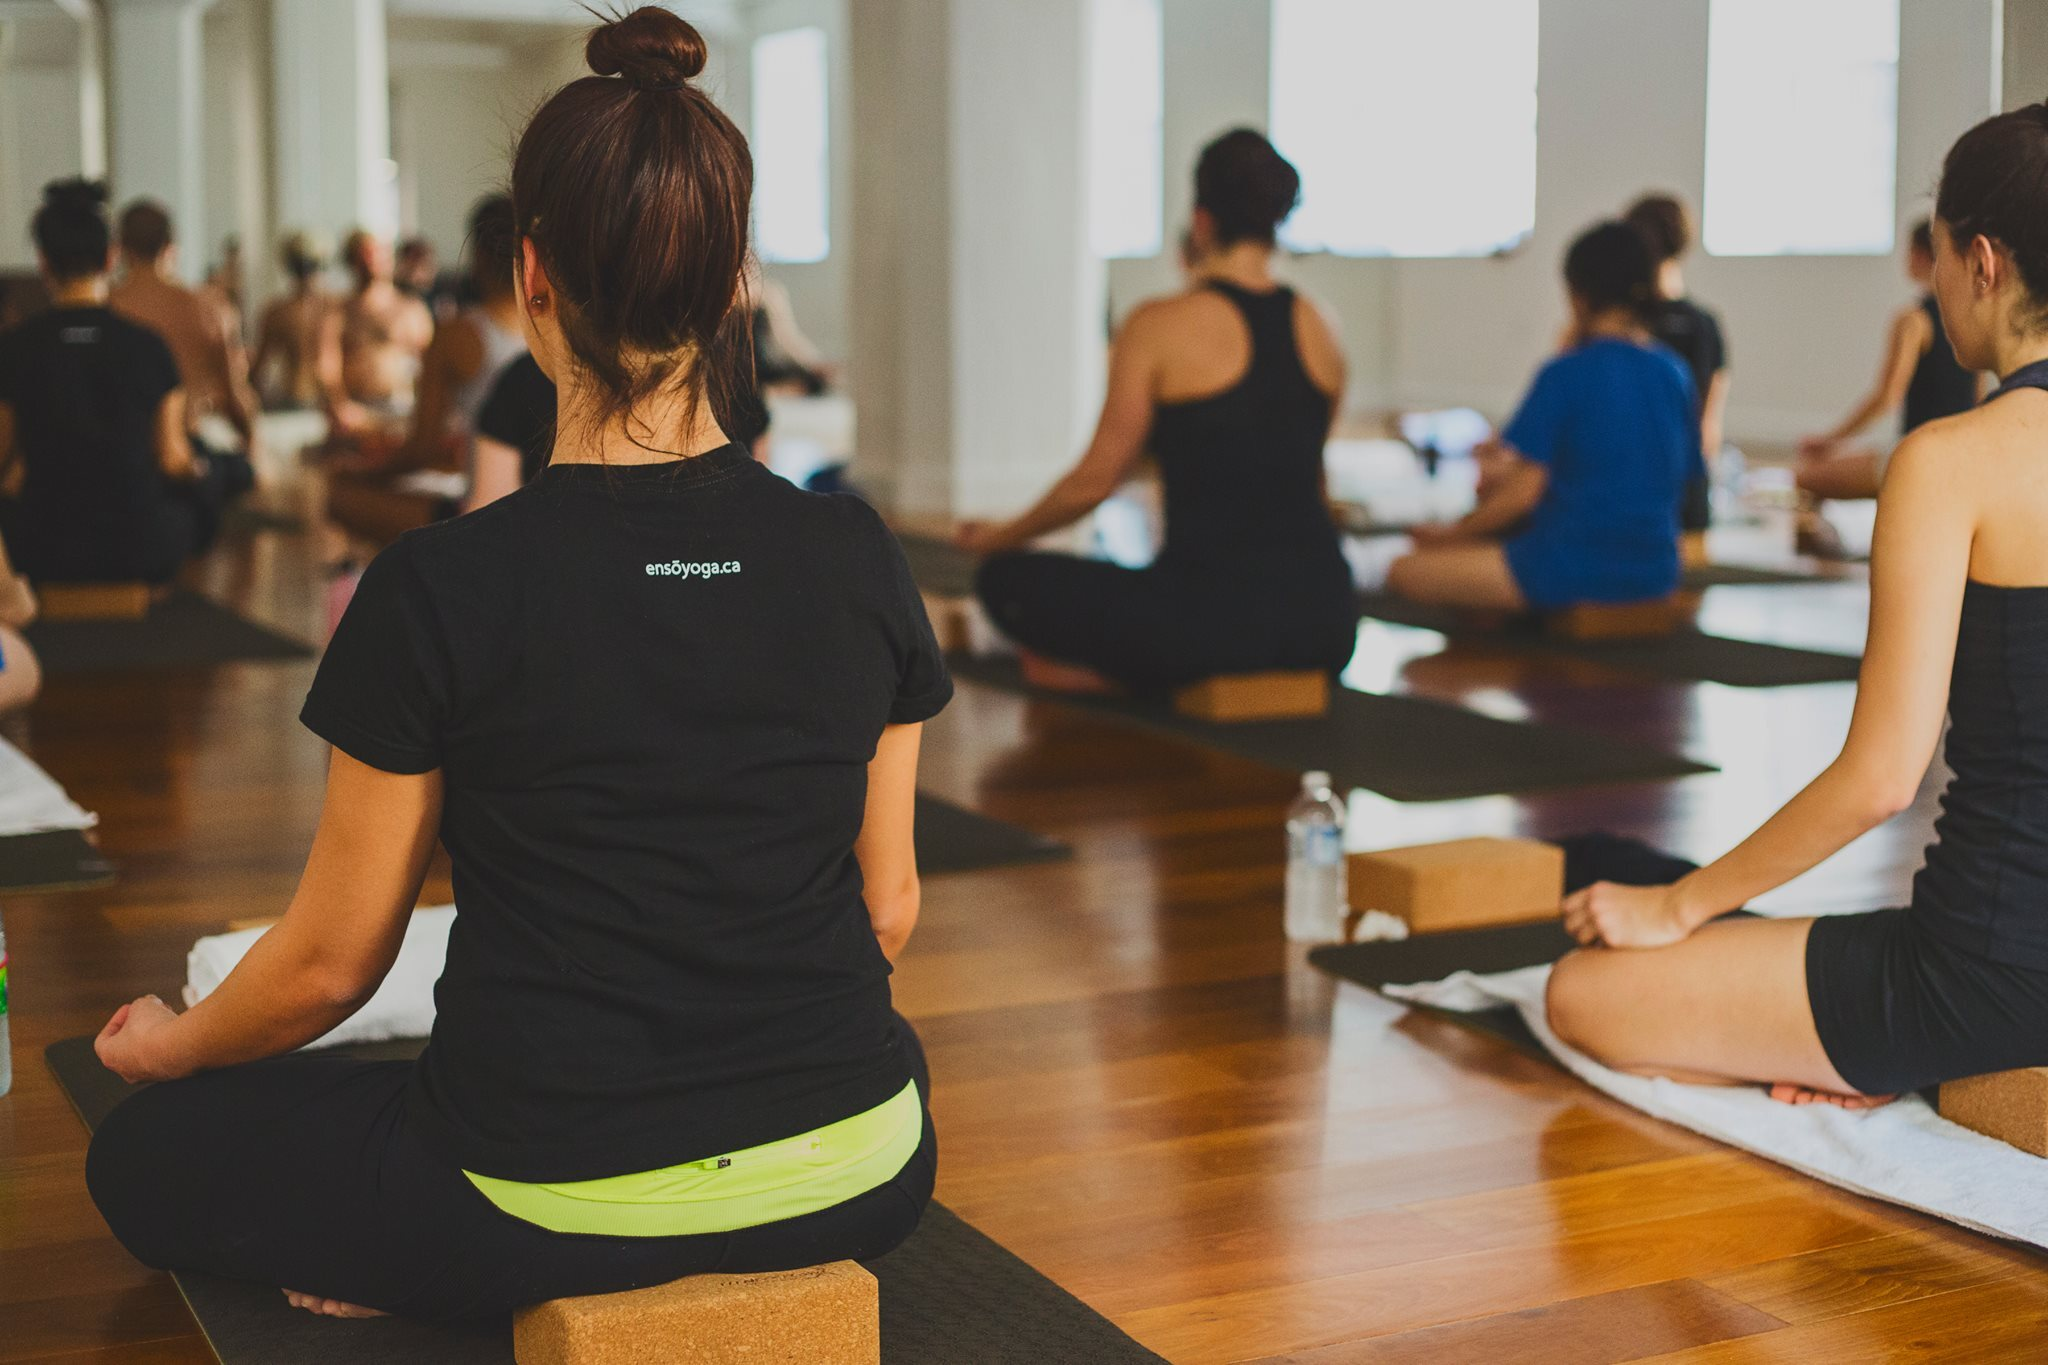 ensō yoga